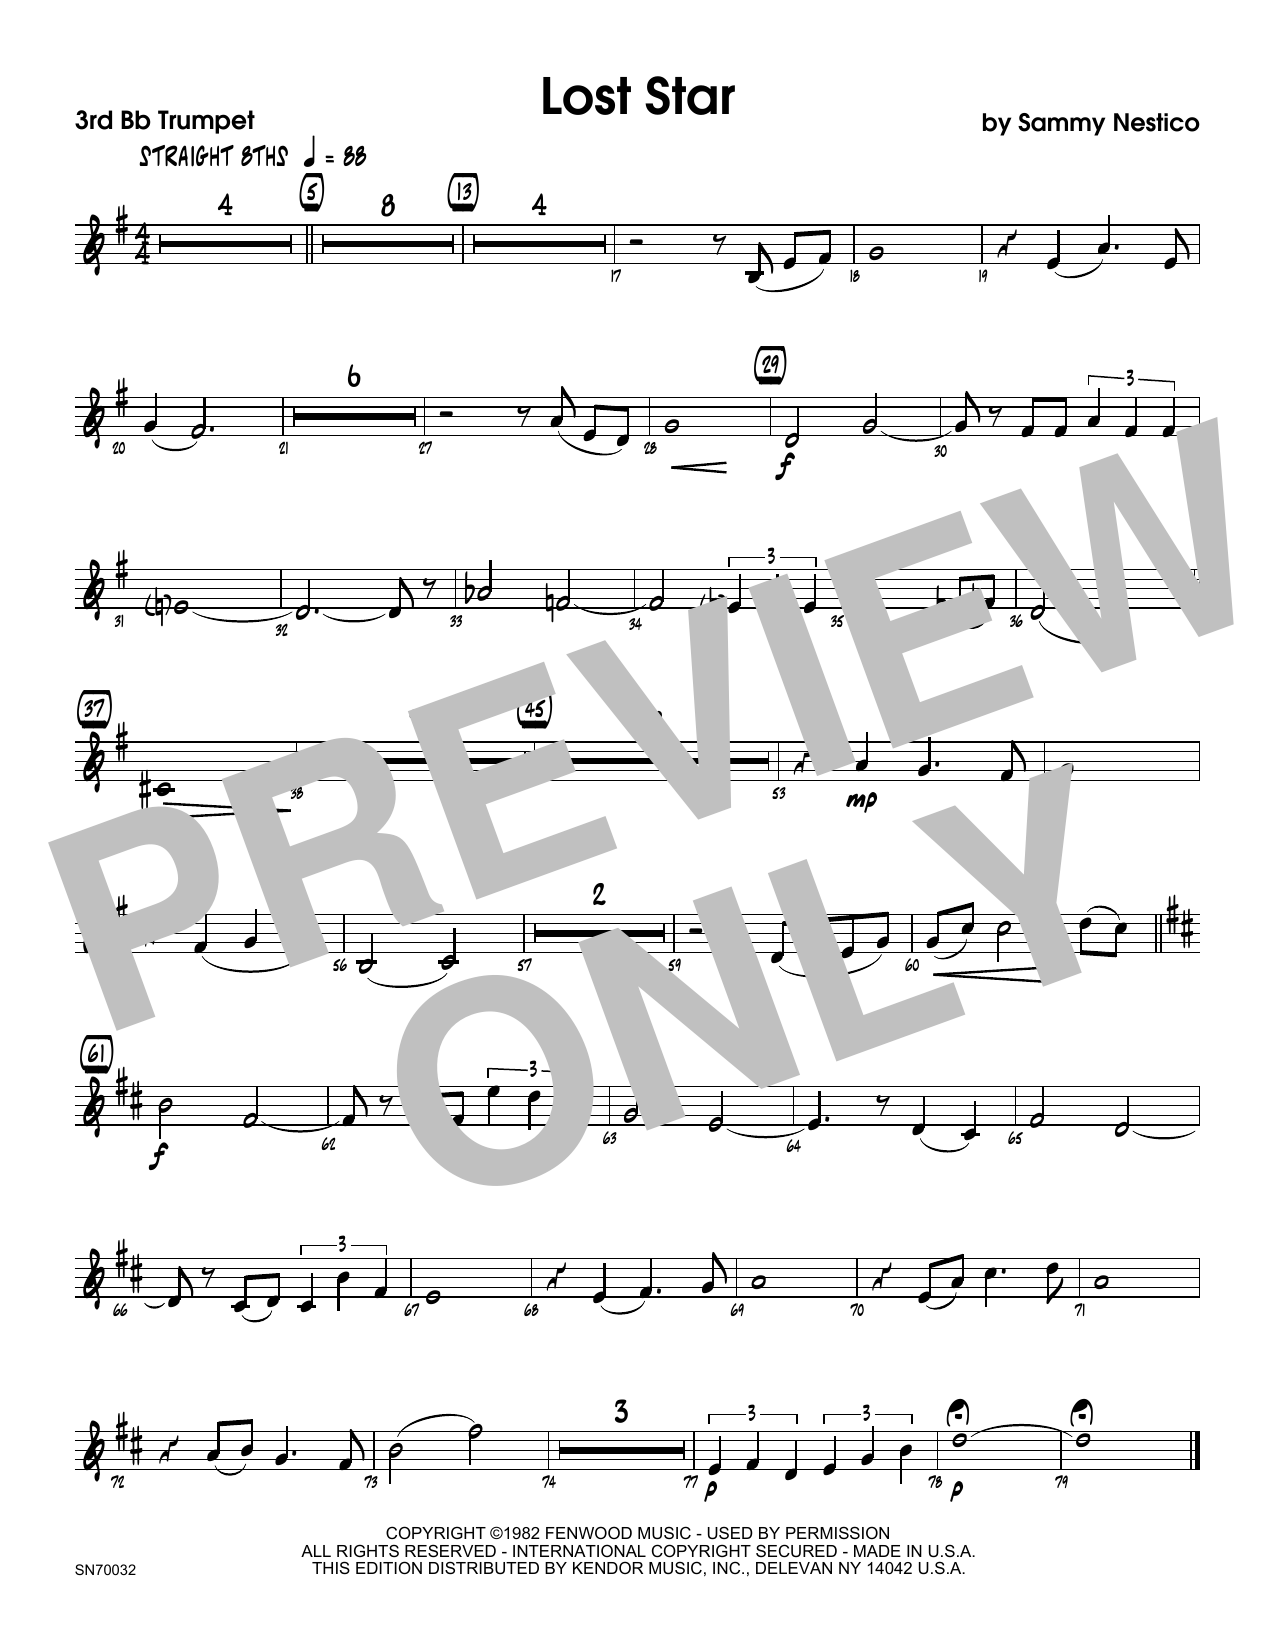 Lost Star - 3rd Bb Trumpet Sheet Music